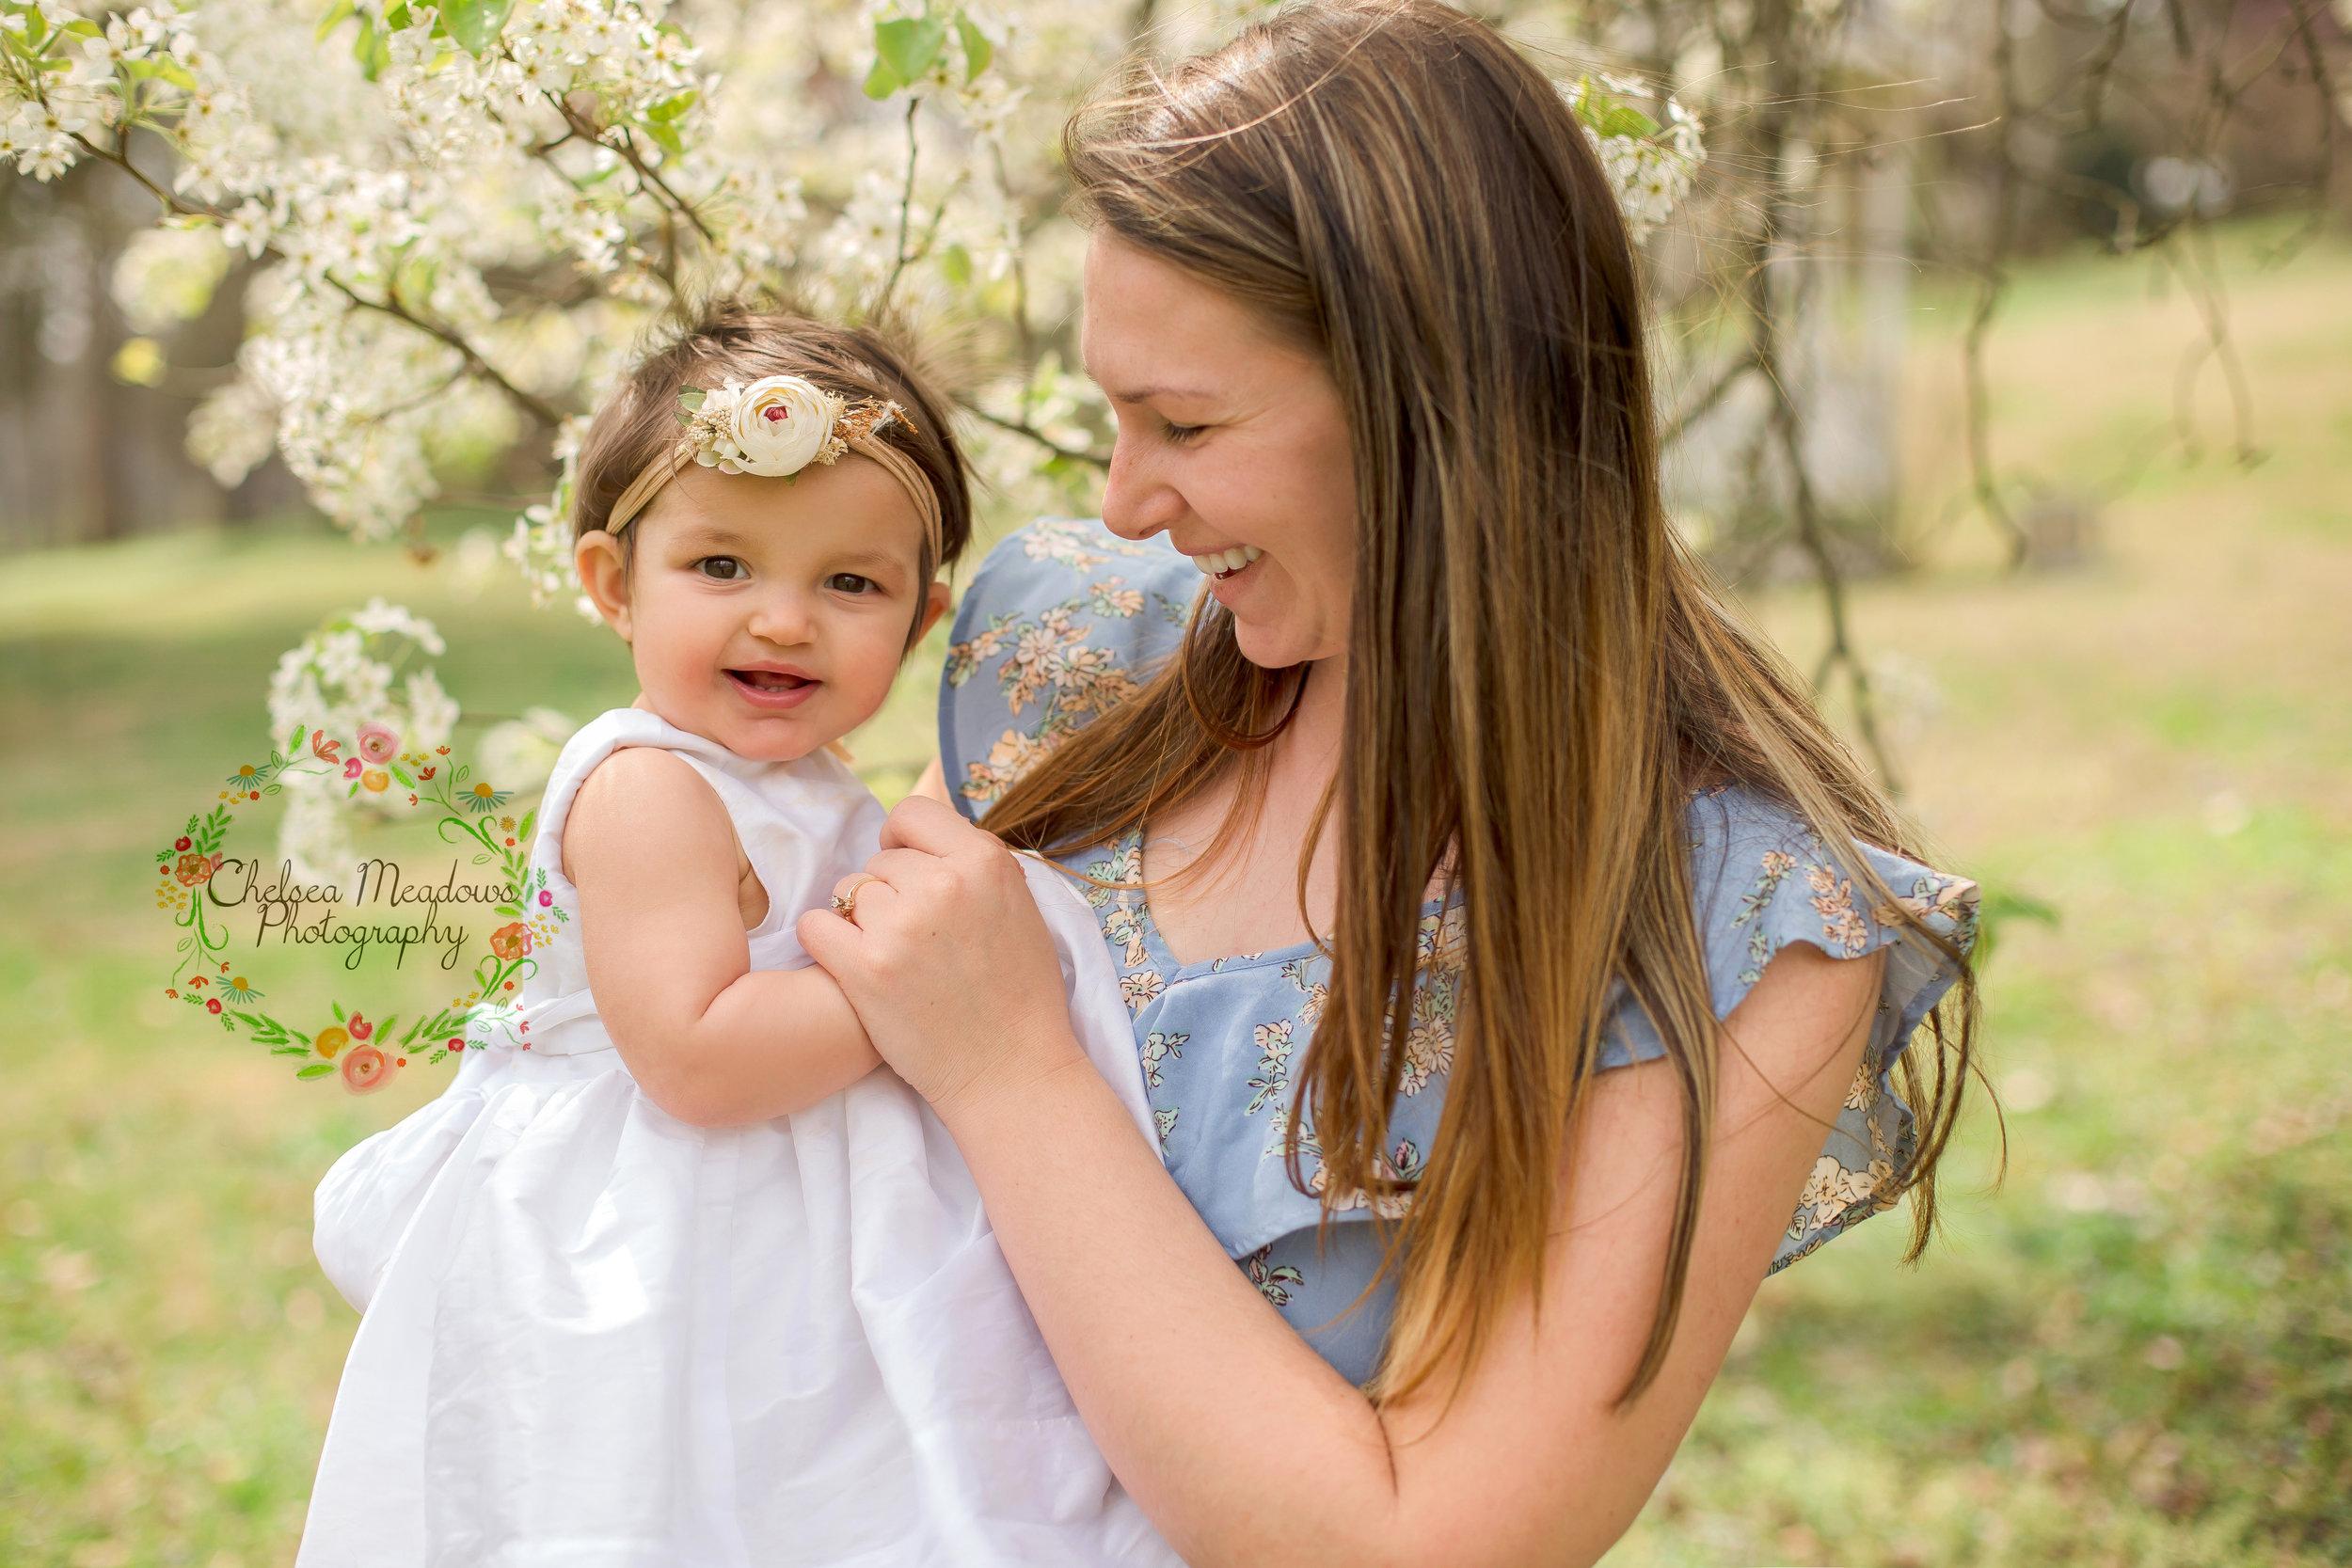 Ellis Family Spring Minis - Nashville Family Photographer - Chelsea Meadows Photography (11).jpg